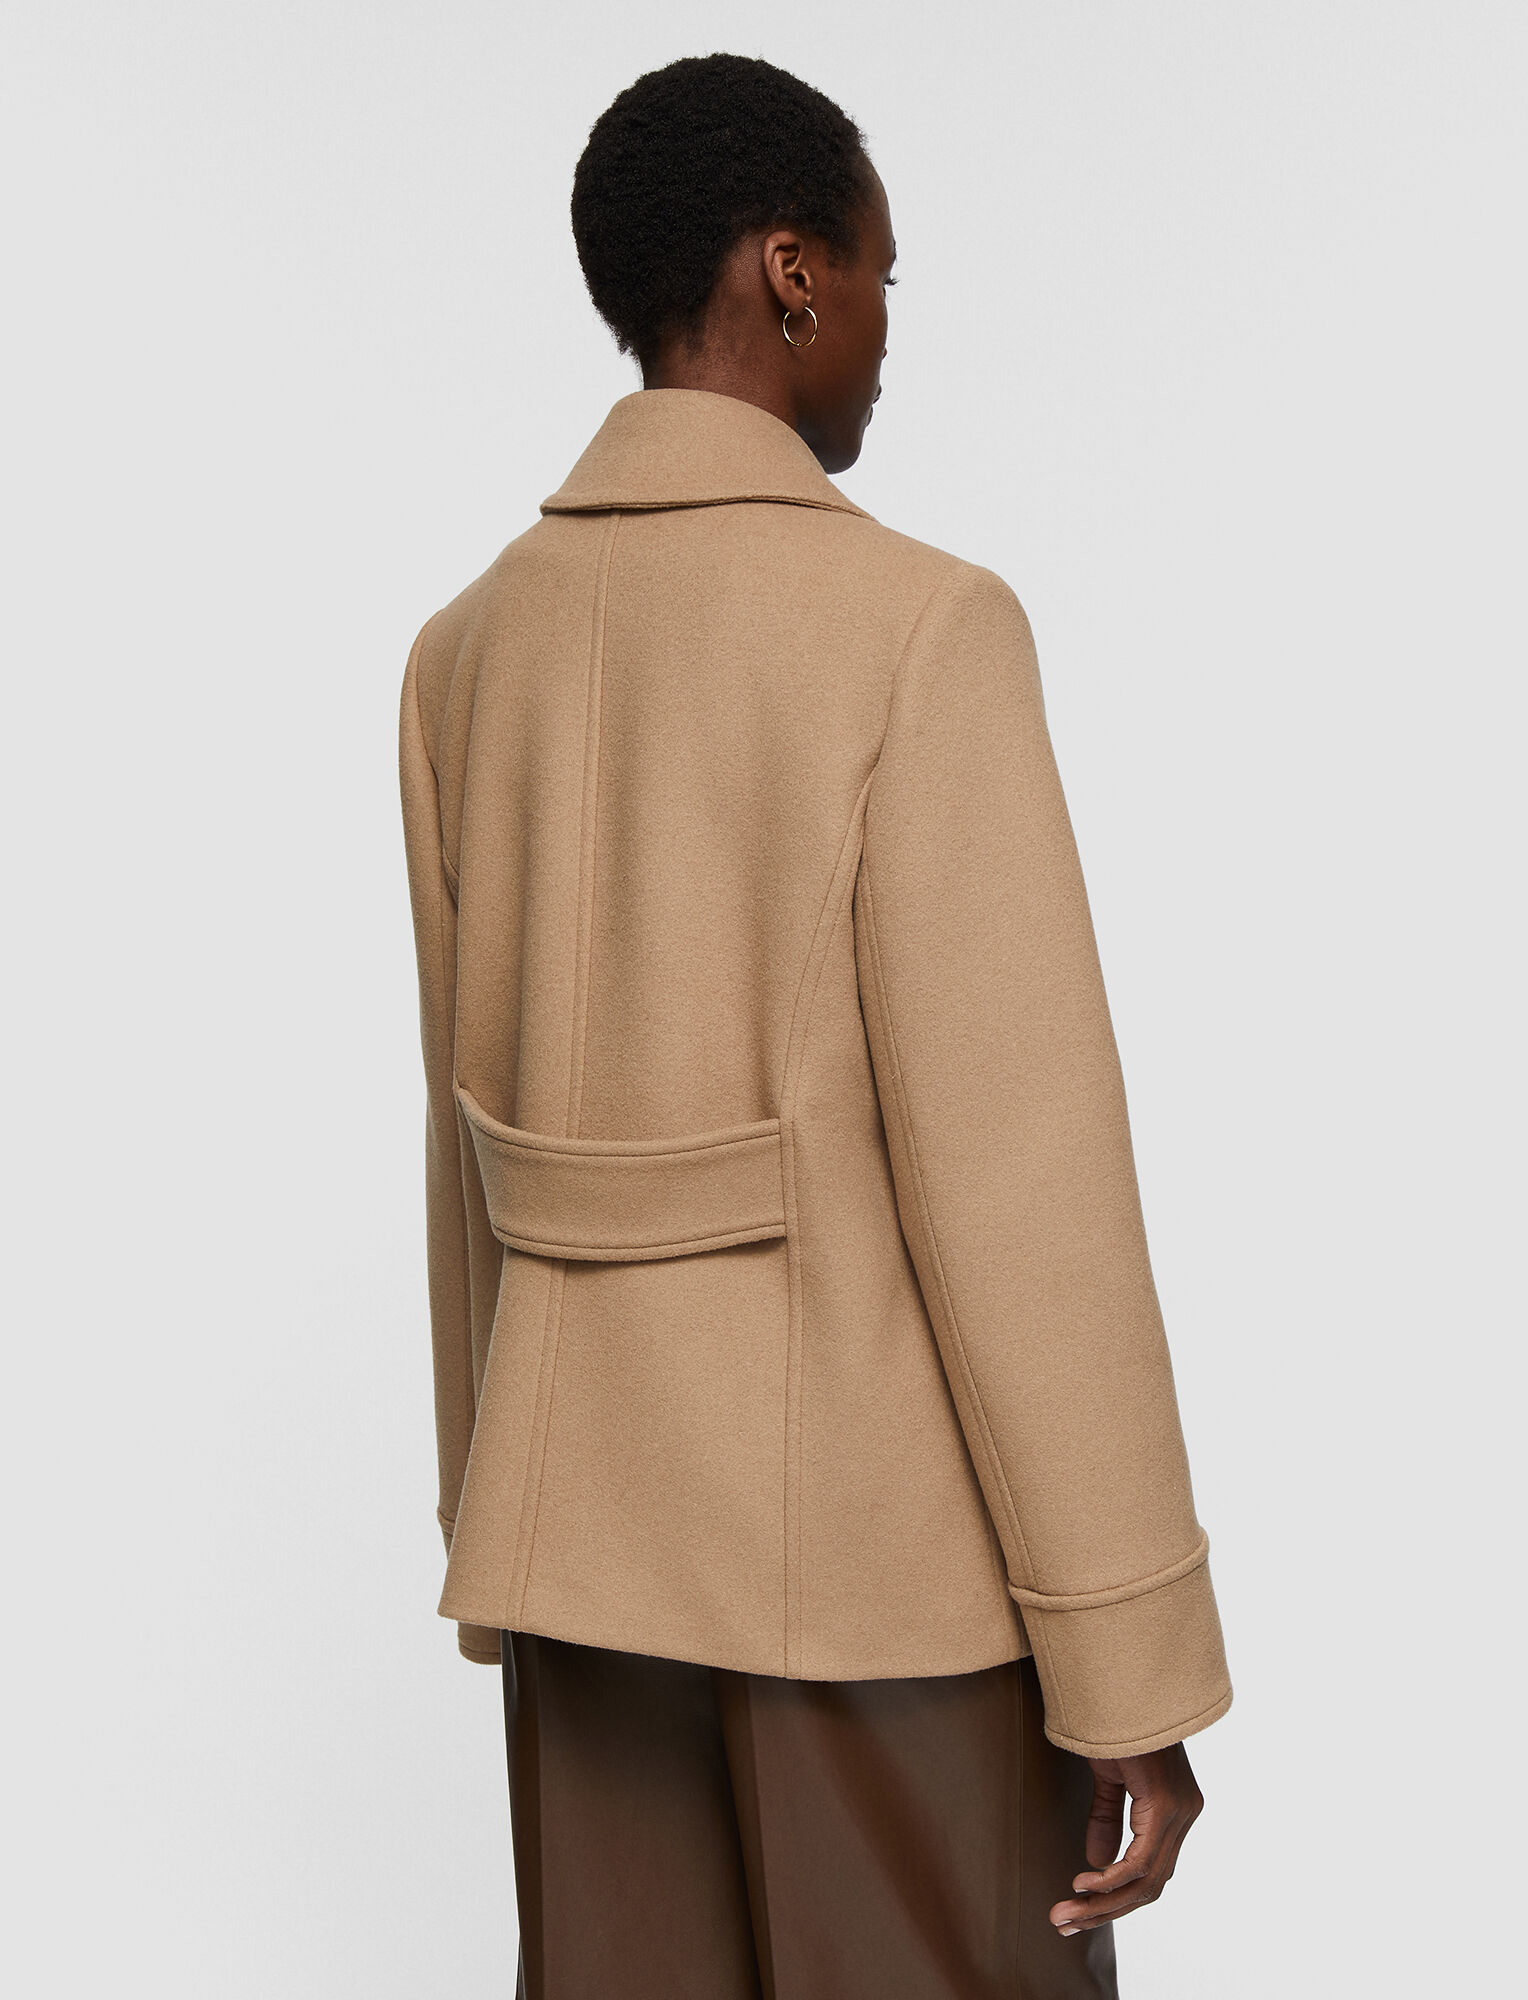 Joseph, Wool Coating Jagger Coat, in Camel